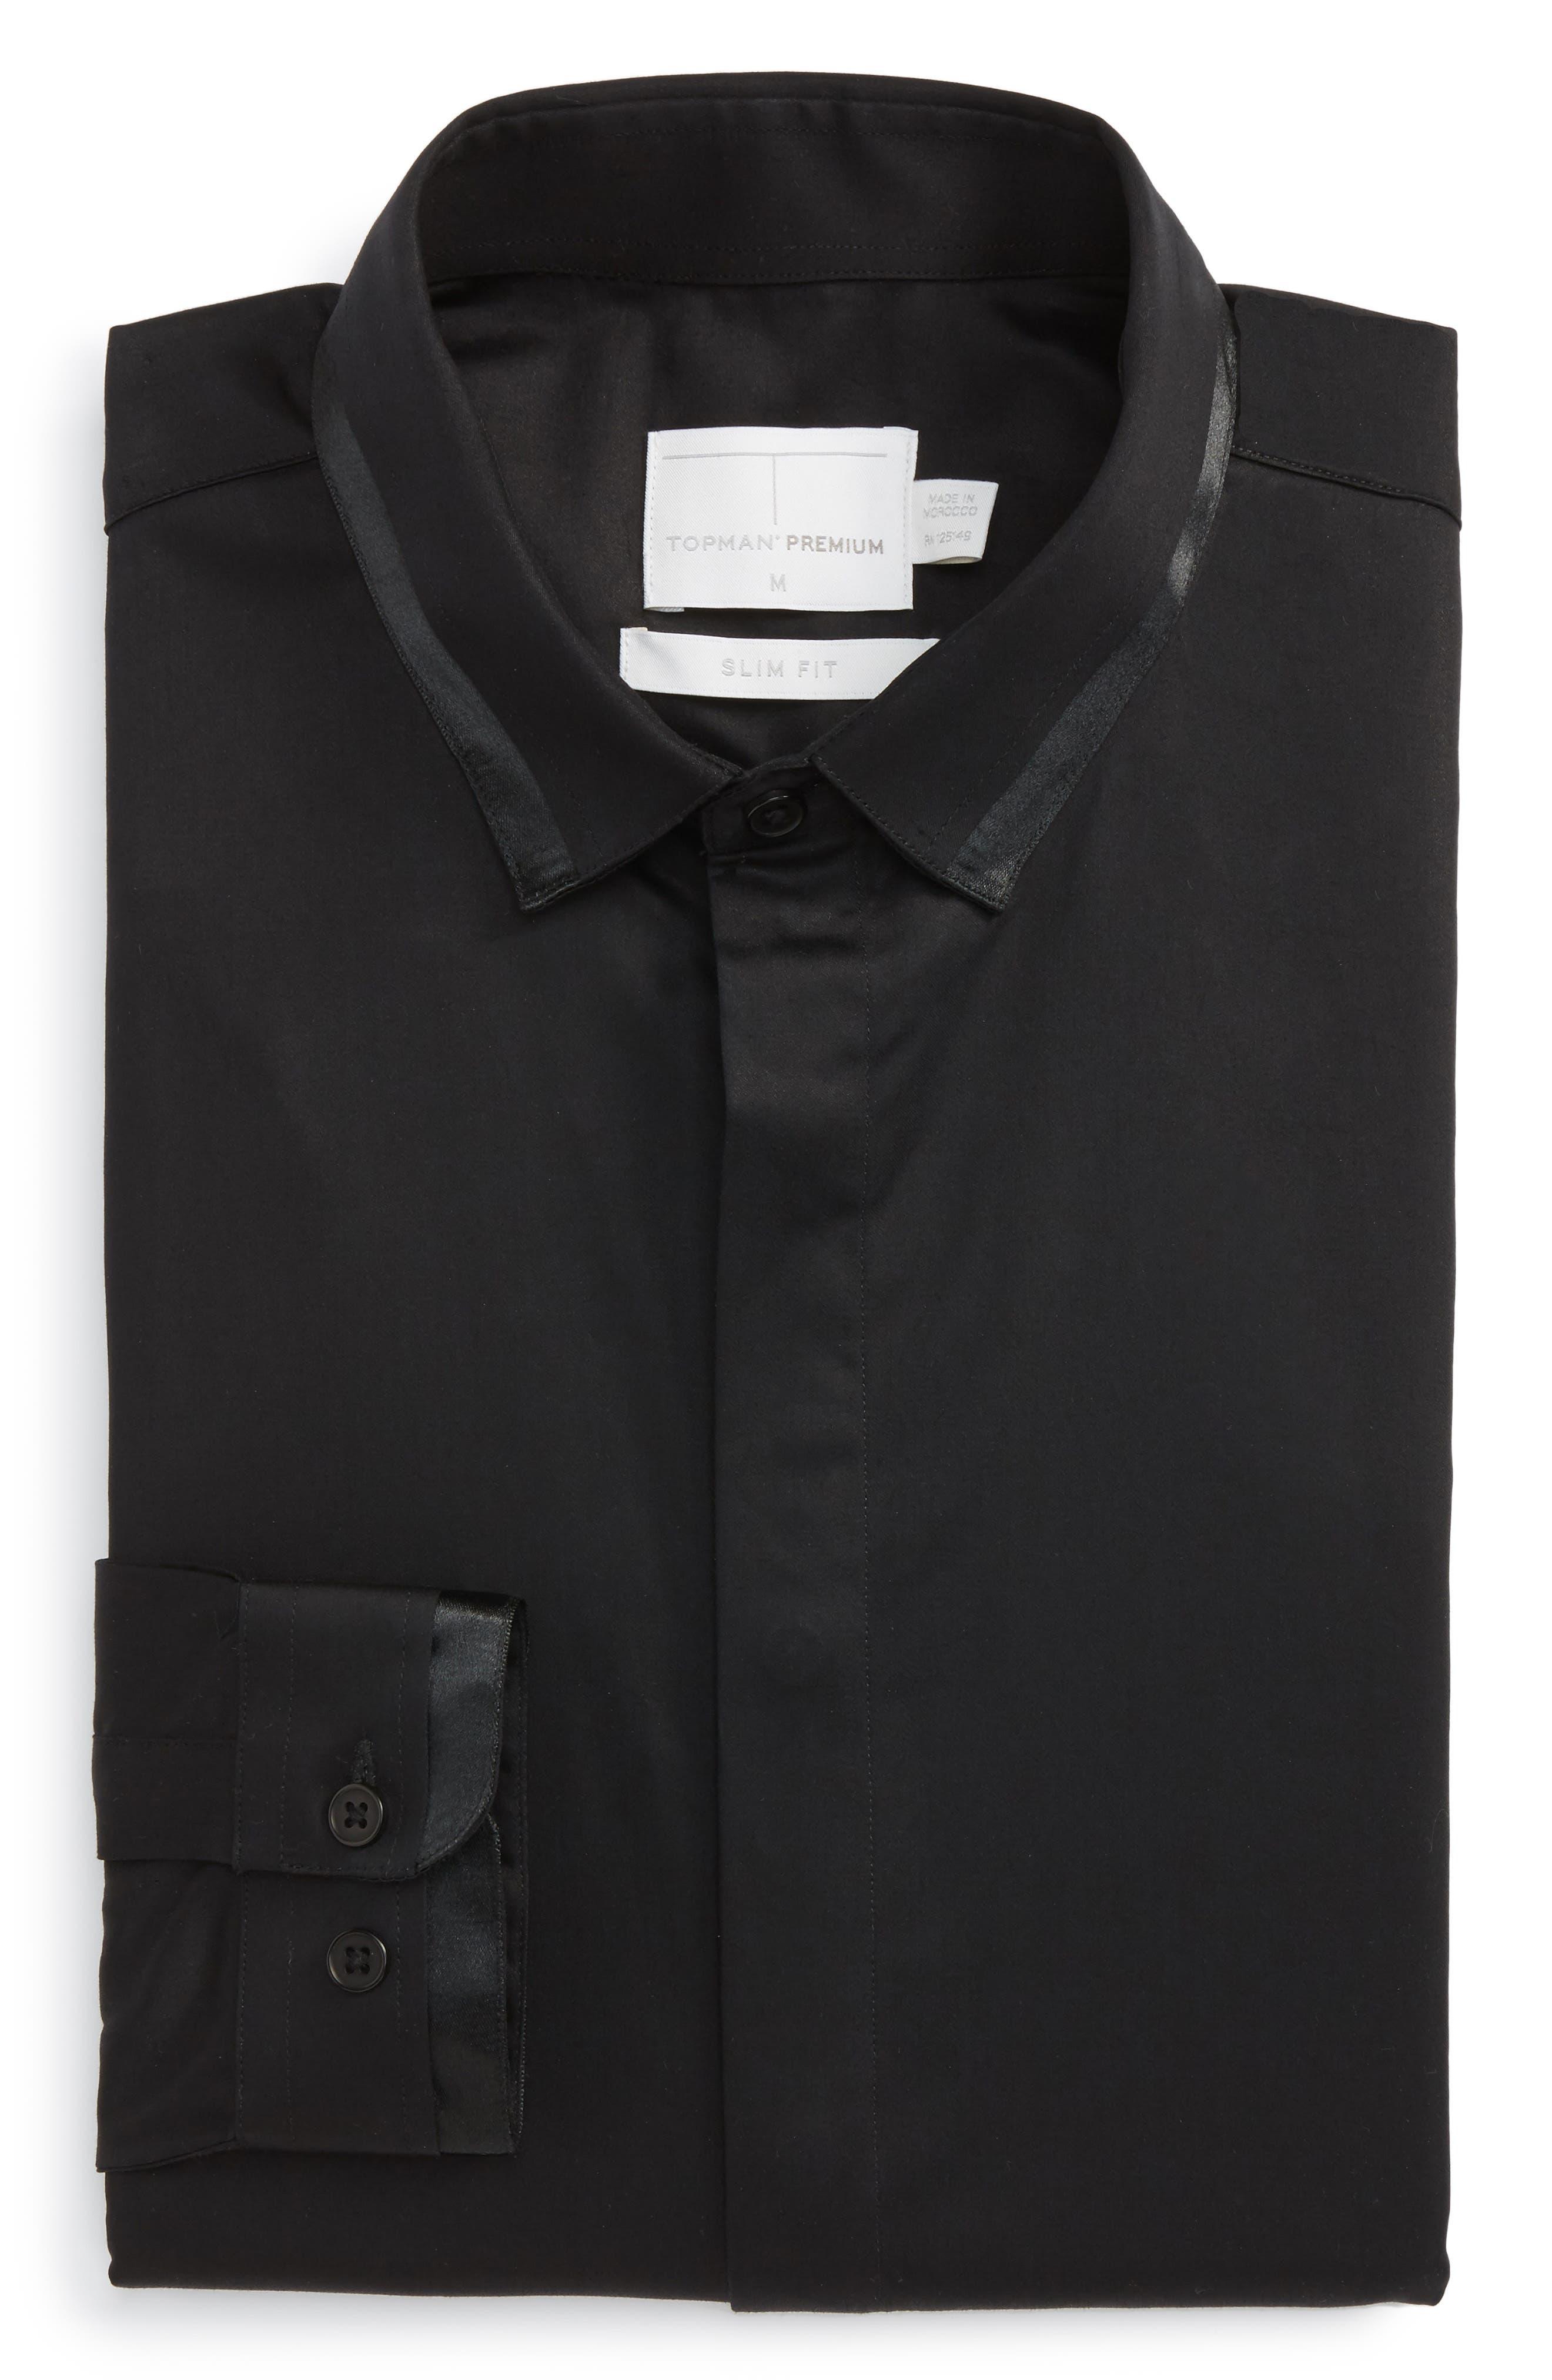 Main Image - Topman Satin Trim Woven Shirt